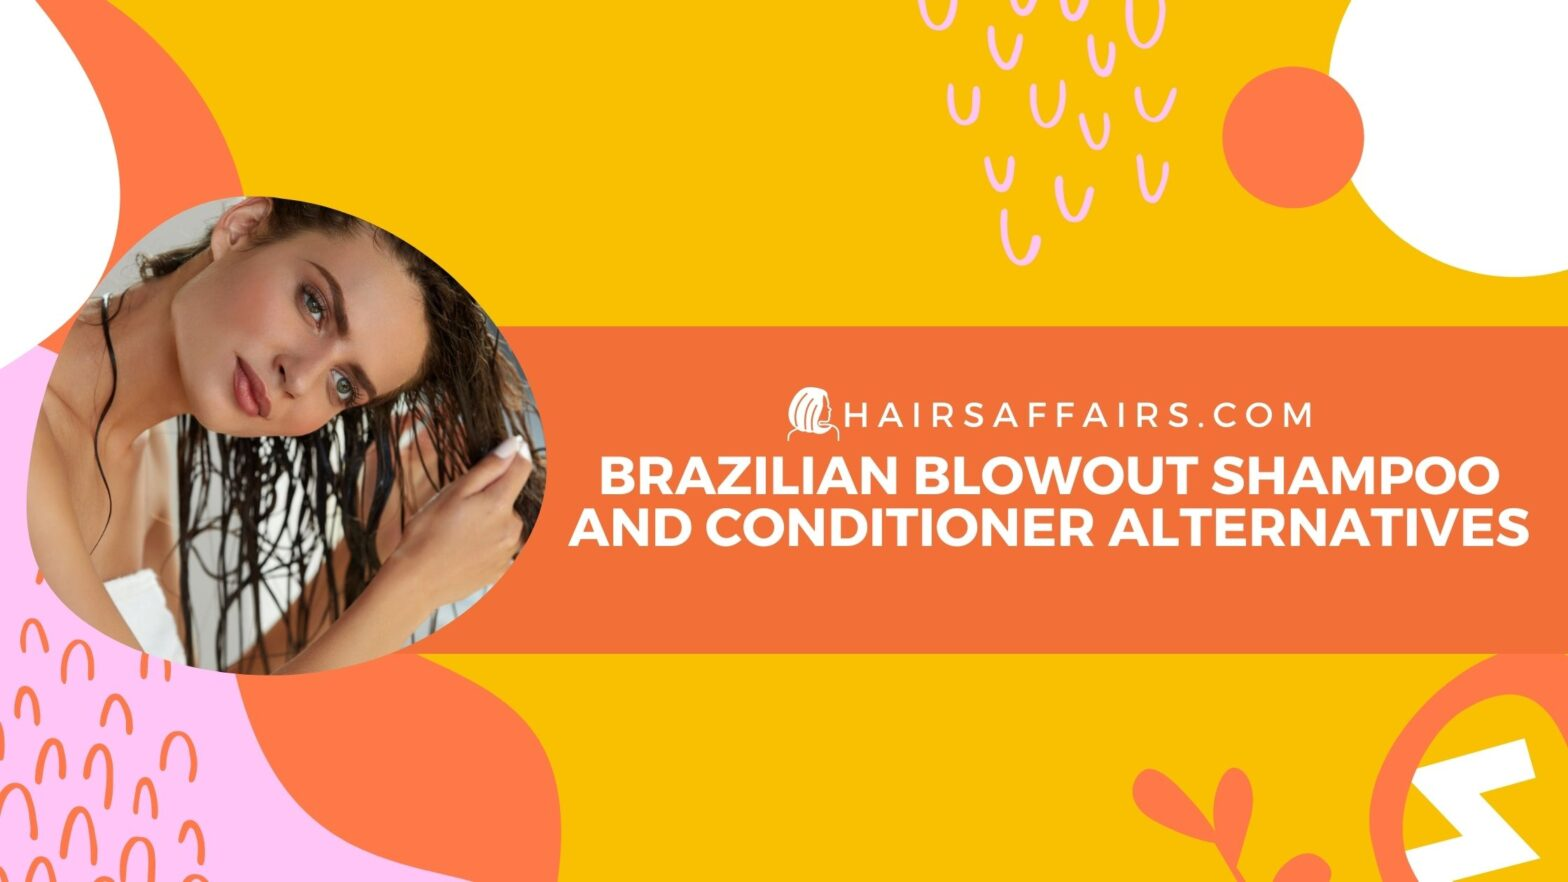 brazilian blowout shampoo and conditioner alternatives